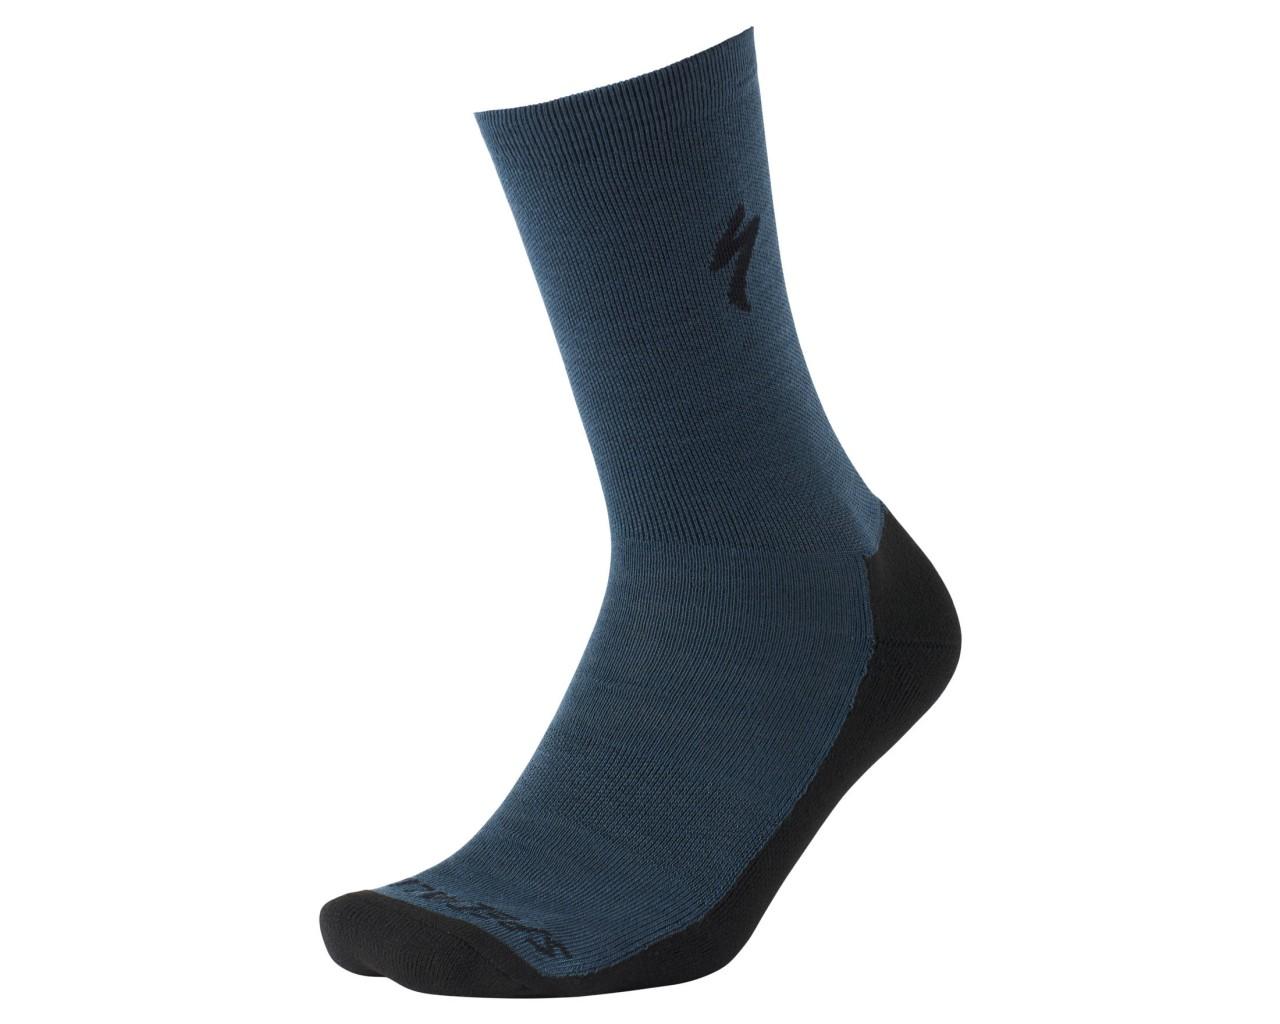 Specialized Primaloft Lightweight Tall Socks | cast blue